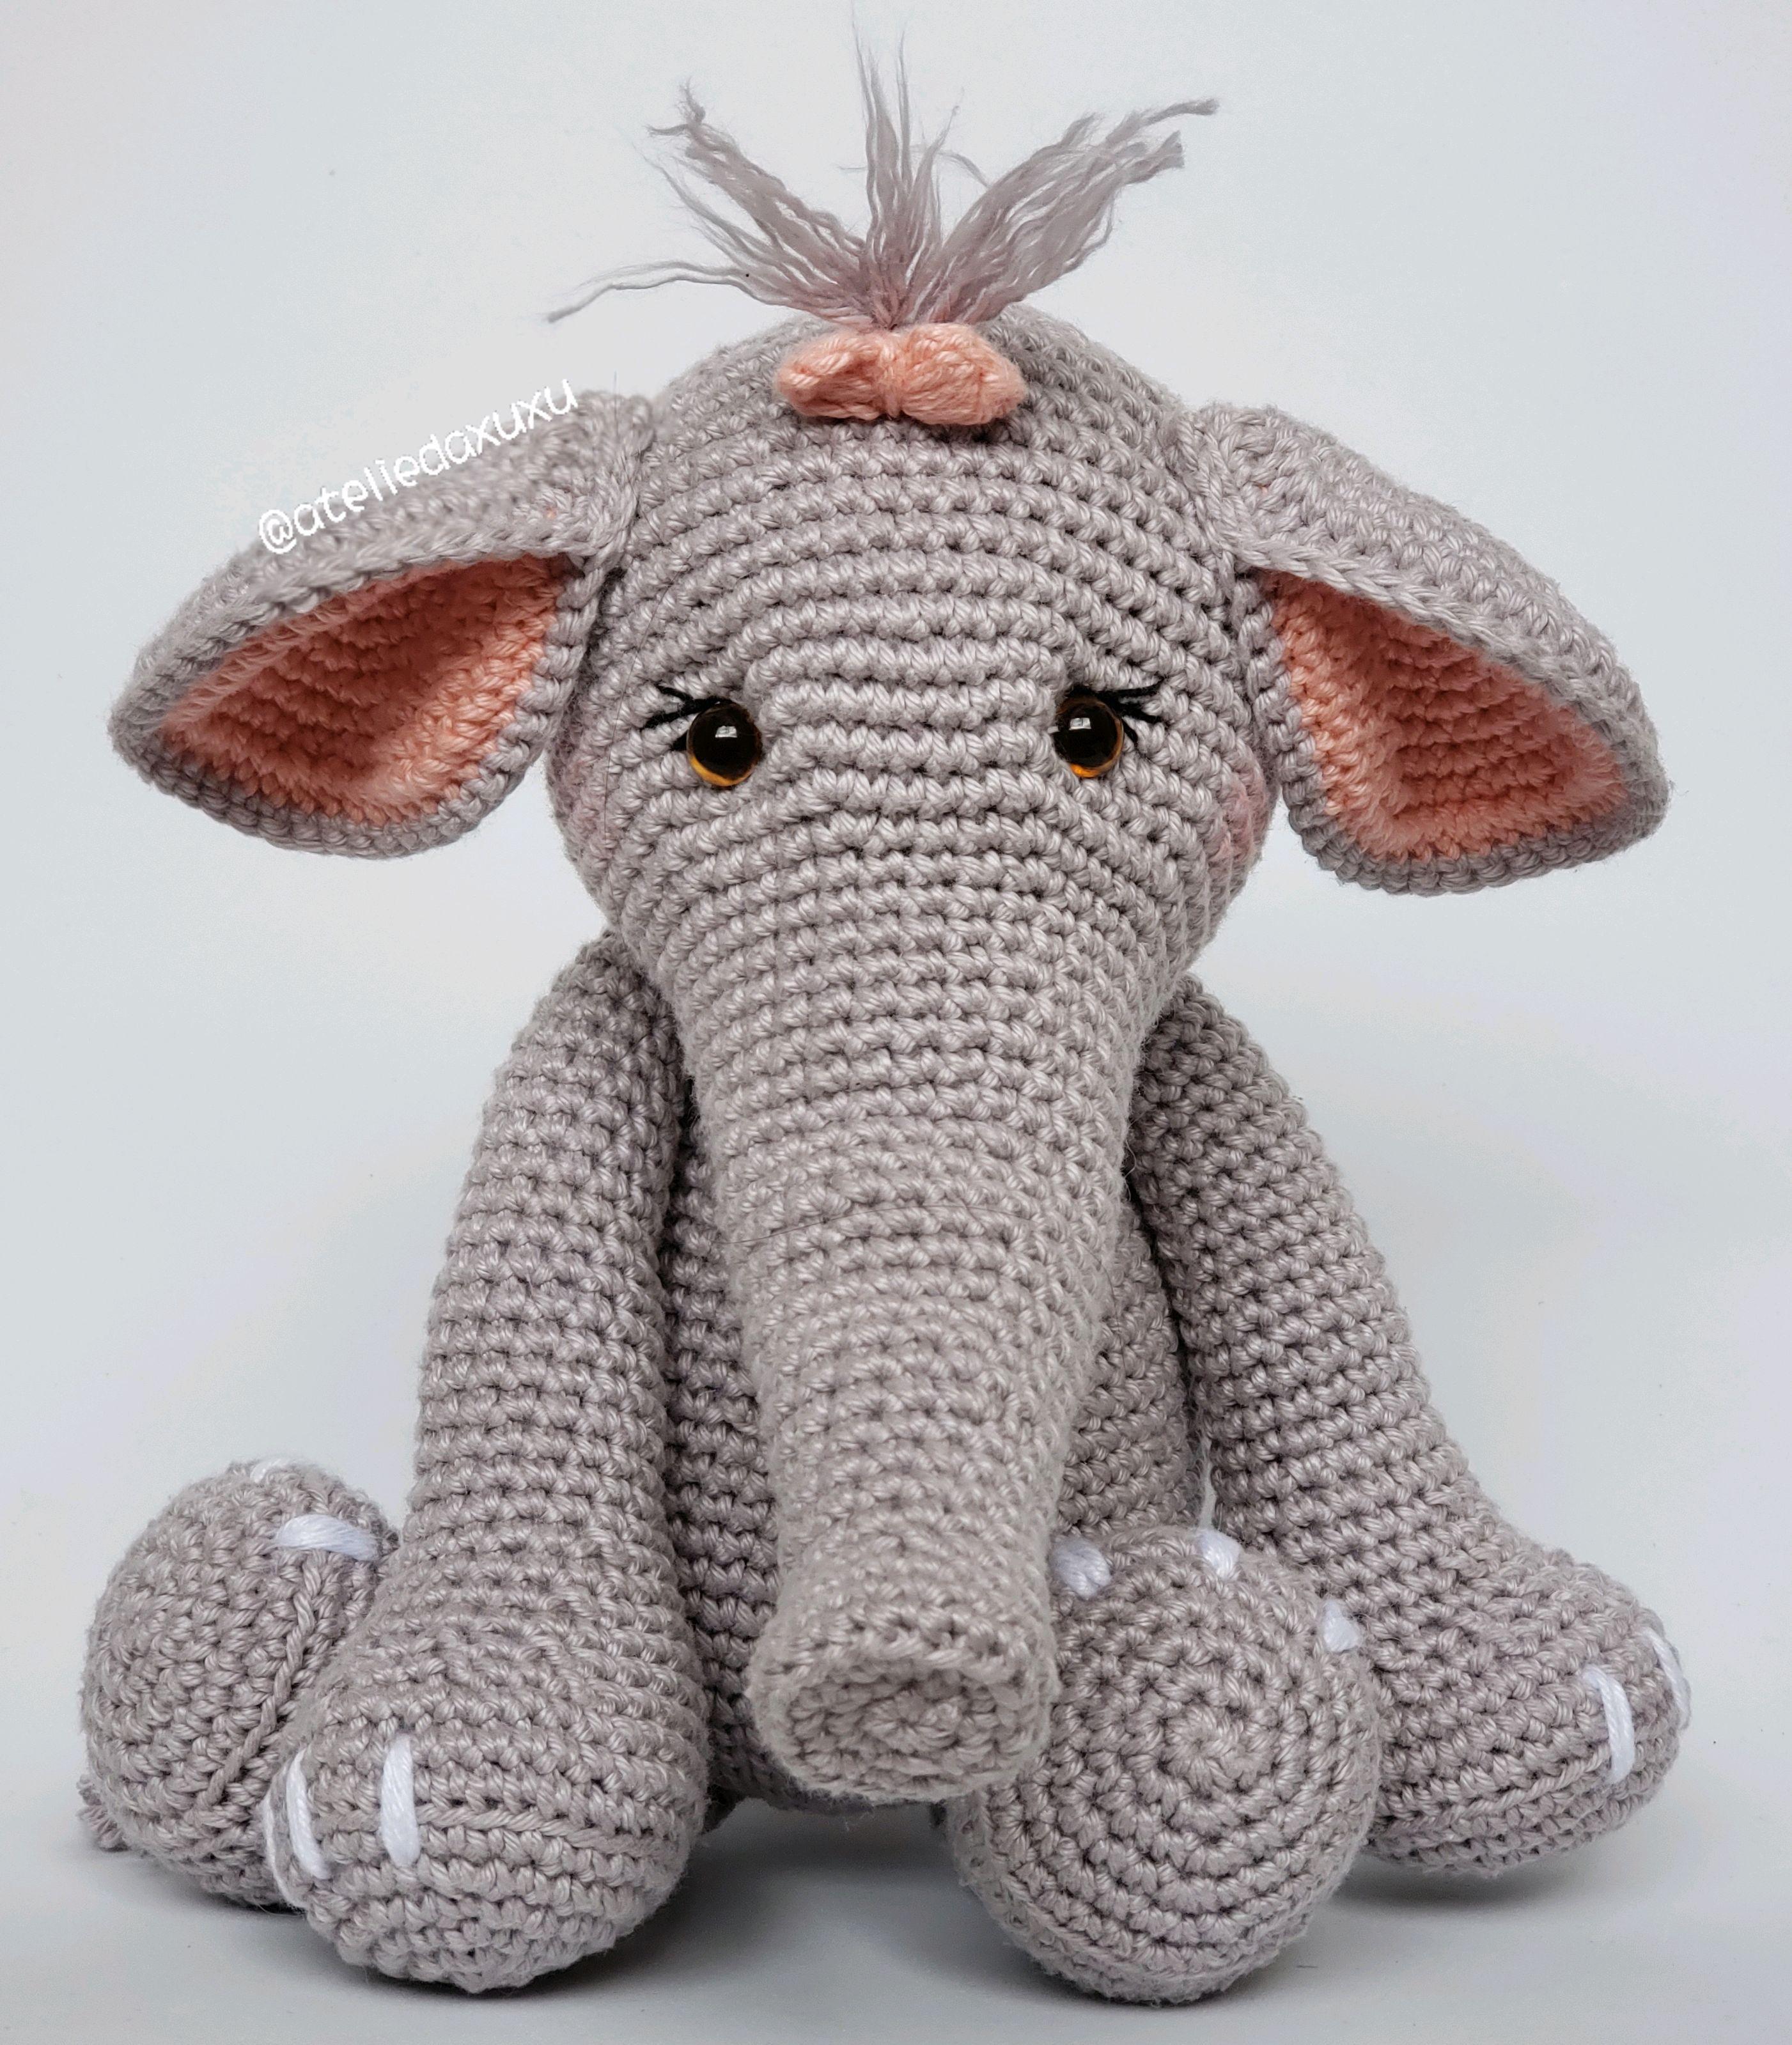 Receitinha 4 - Elefante Amigurumi parte 1 - YouTube   3199x2803